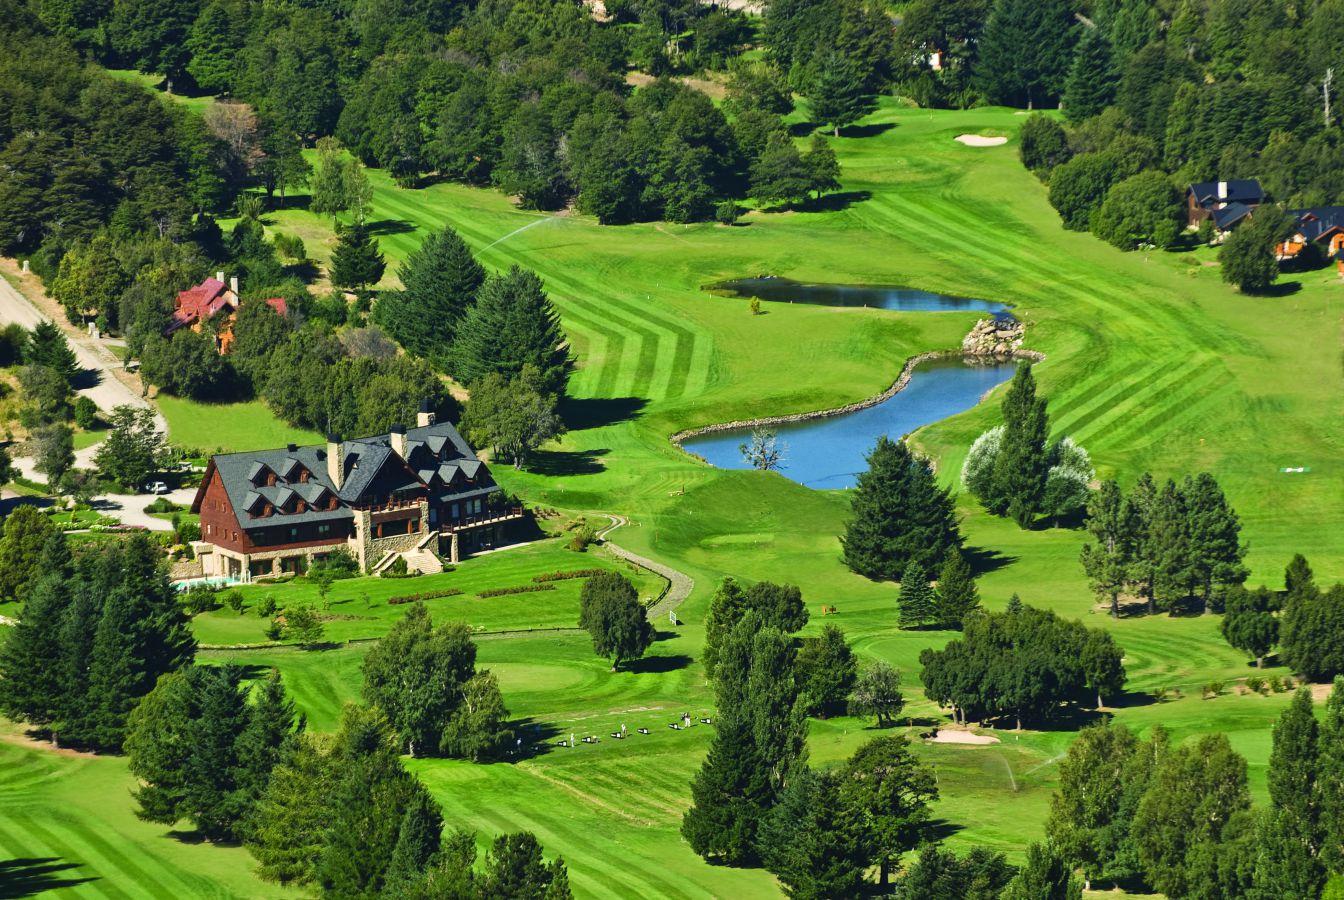 Arelauquen Golf Club